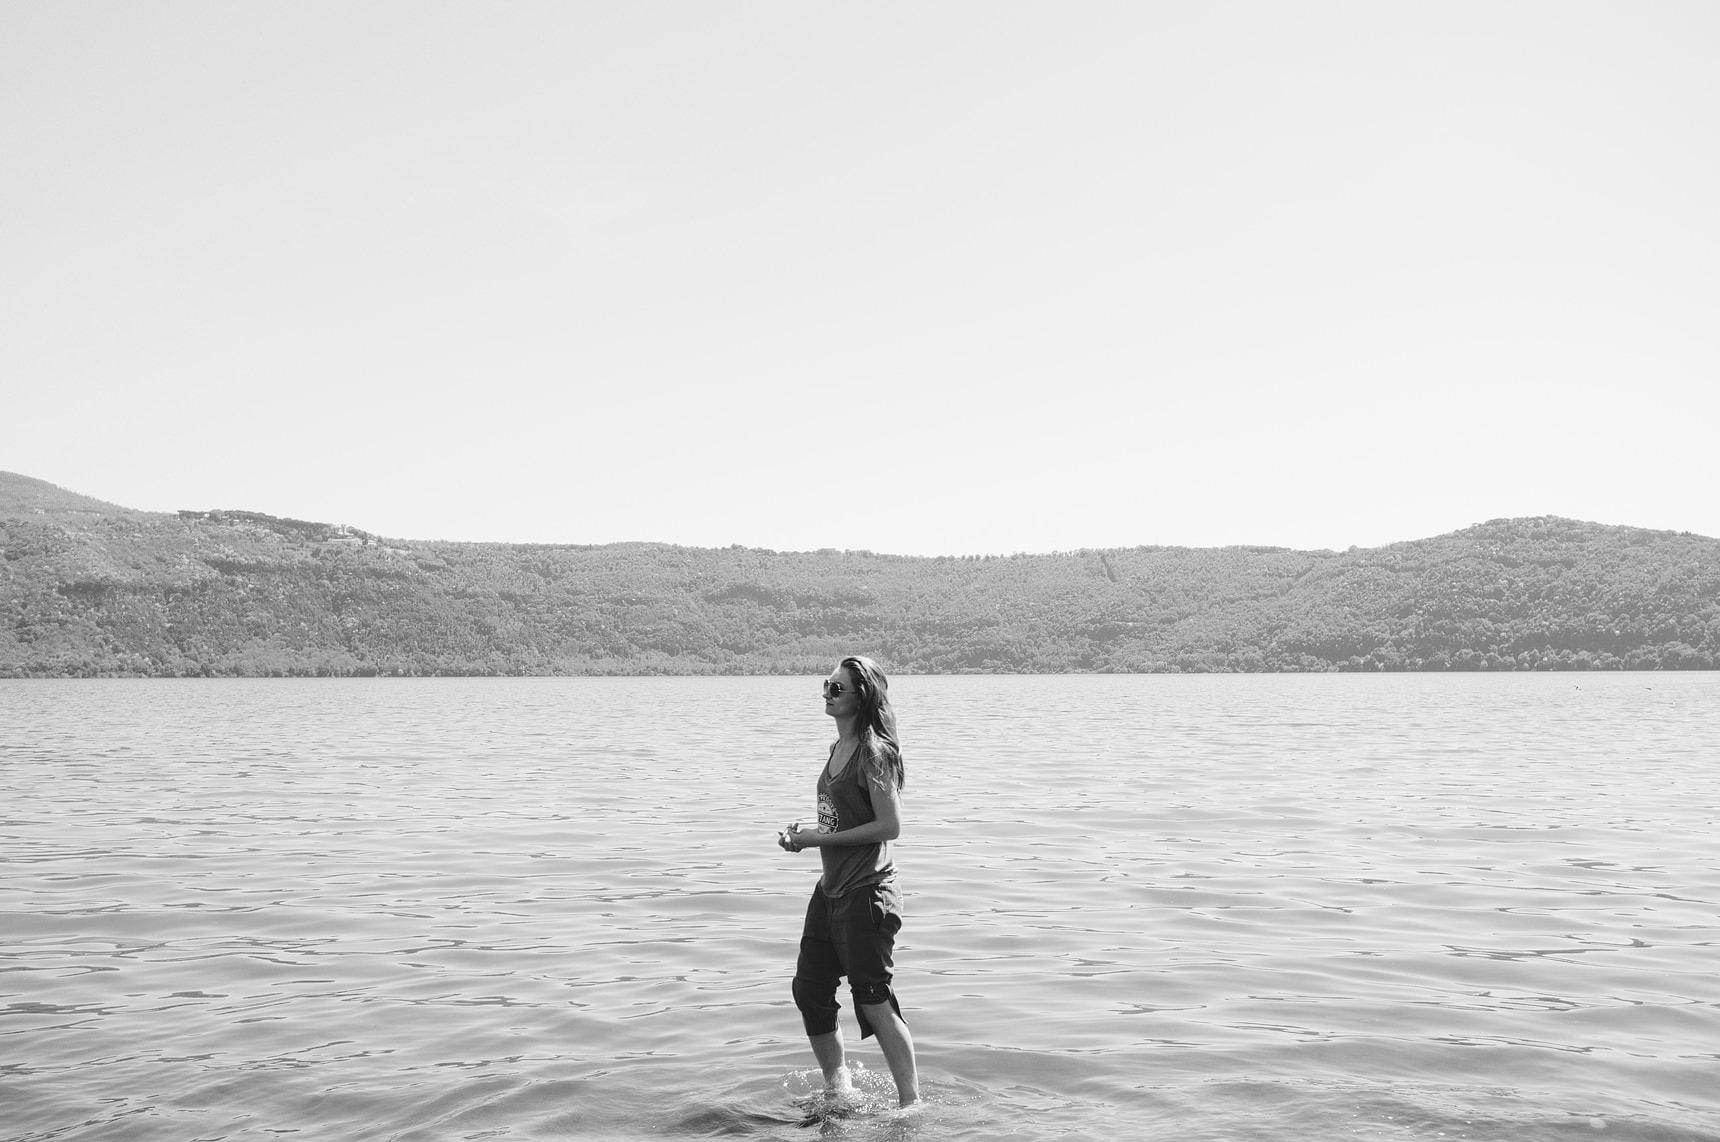 lake lago albano near rome